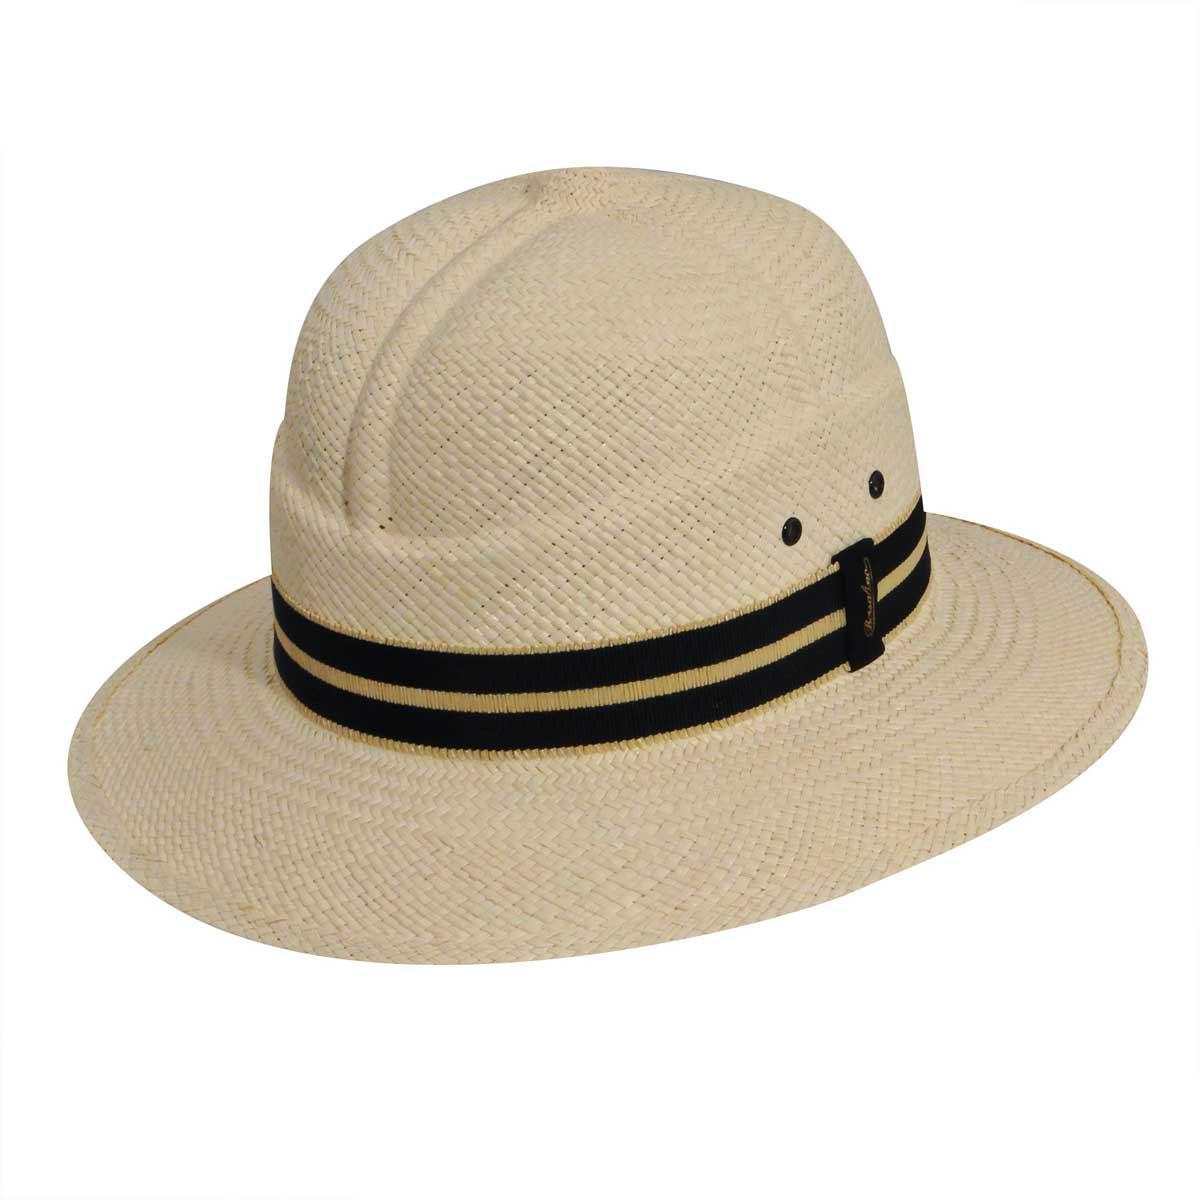 Steampunk Hats | Top Hats | Bowler Quito Panama Colonial Fedora $310.00 AT vintagedancer.com